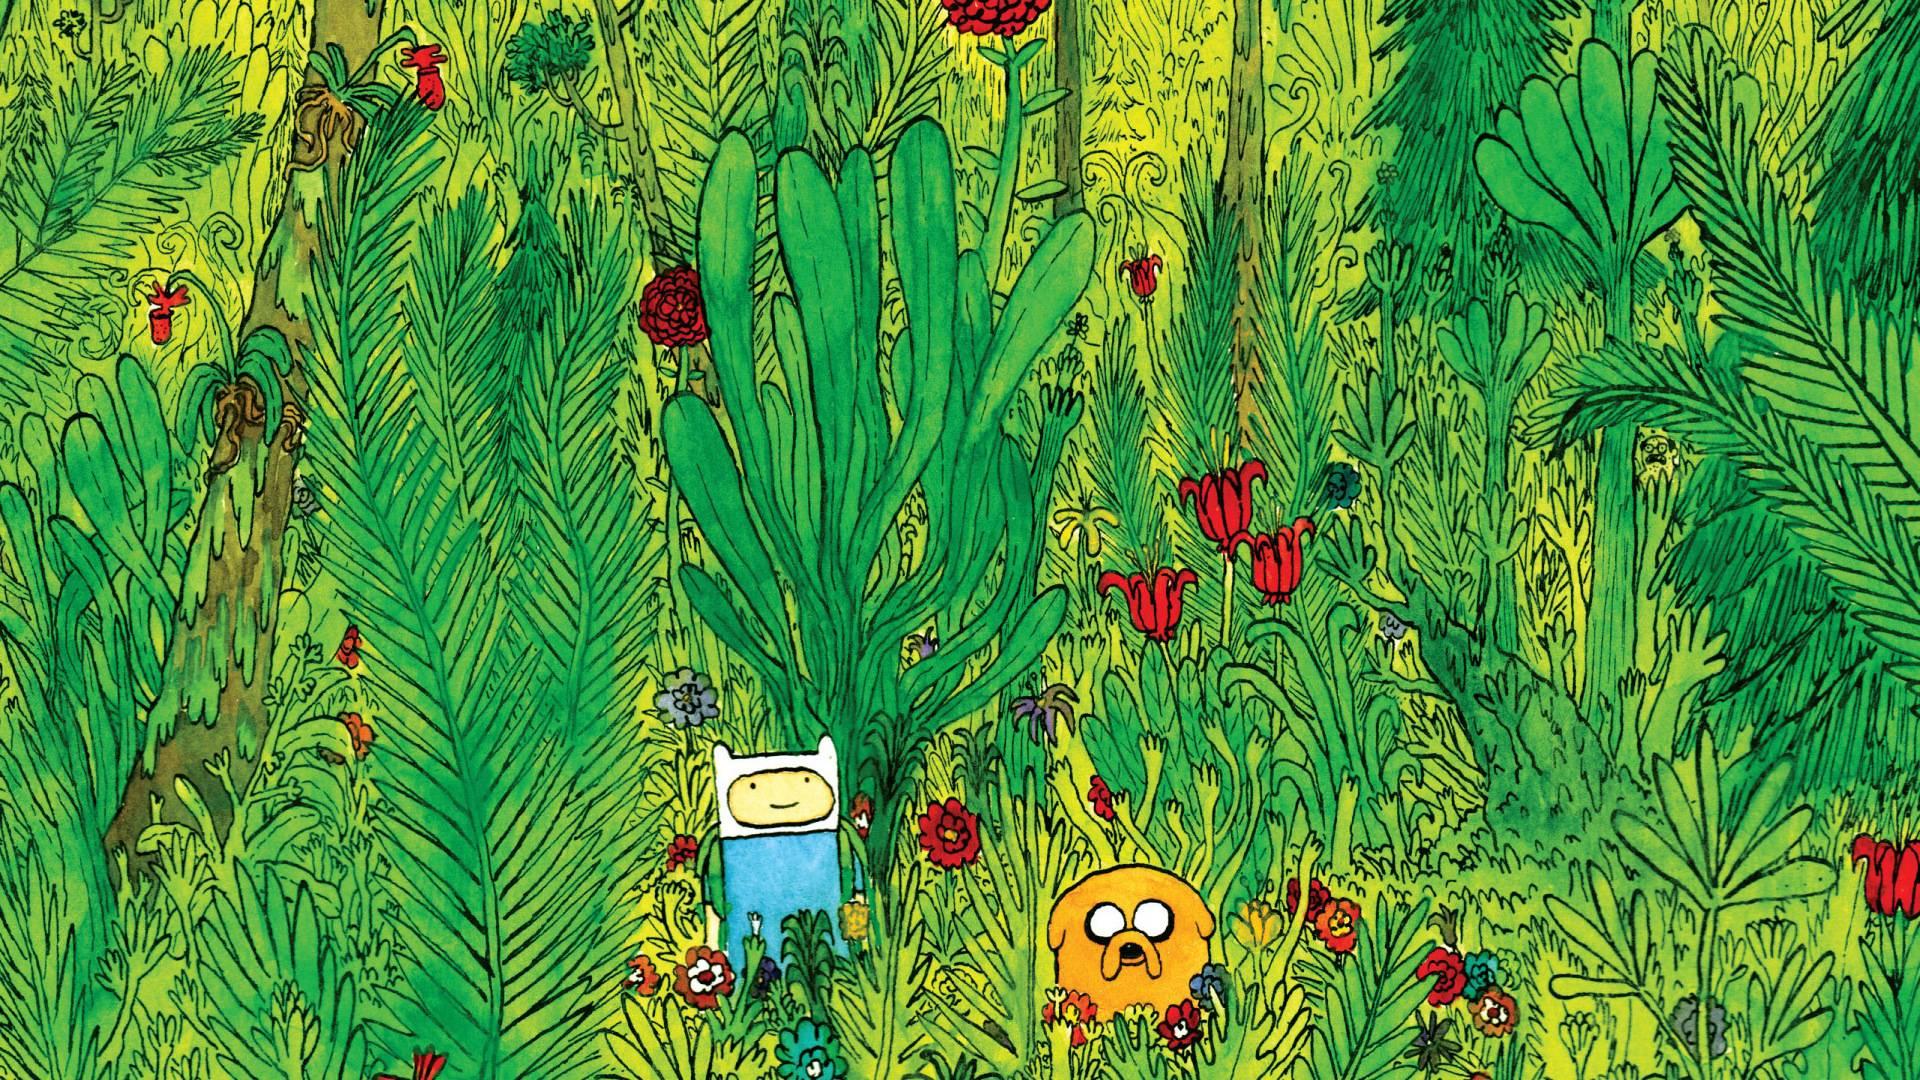 Adventure-Time-HD-Hora-de-Aventura-Papel-de-Parede-1920×1080-wallpaper-wpc9002062